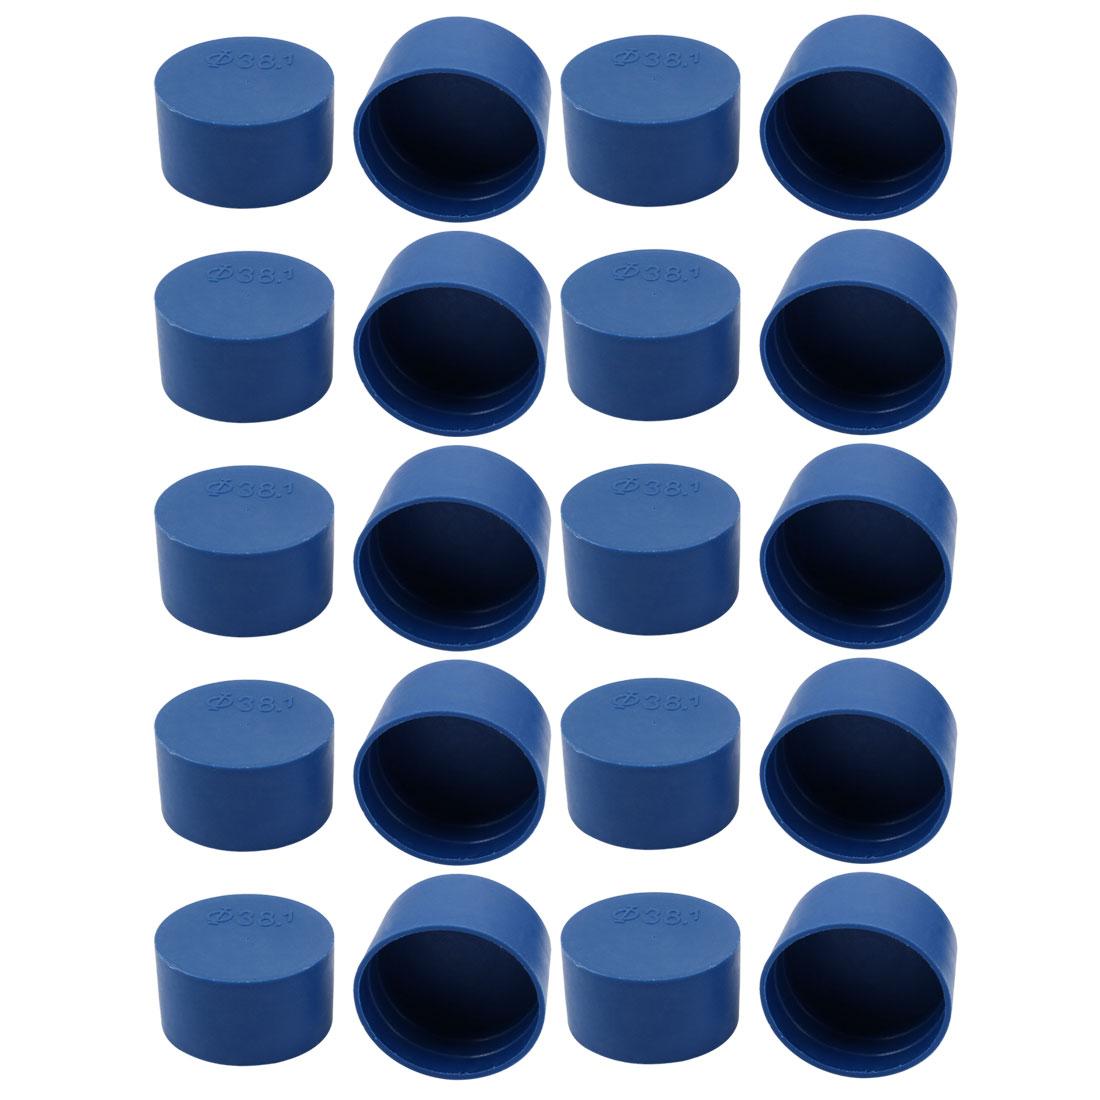 20pcs 38mm Inner Dia PE Plastic End Cap Bolt Thread Protector Tube Cover Blue